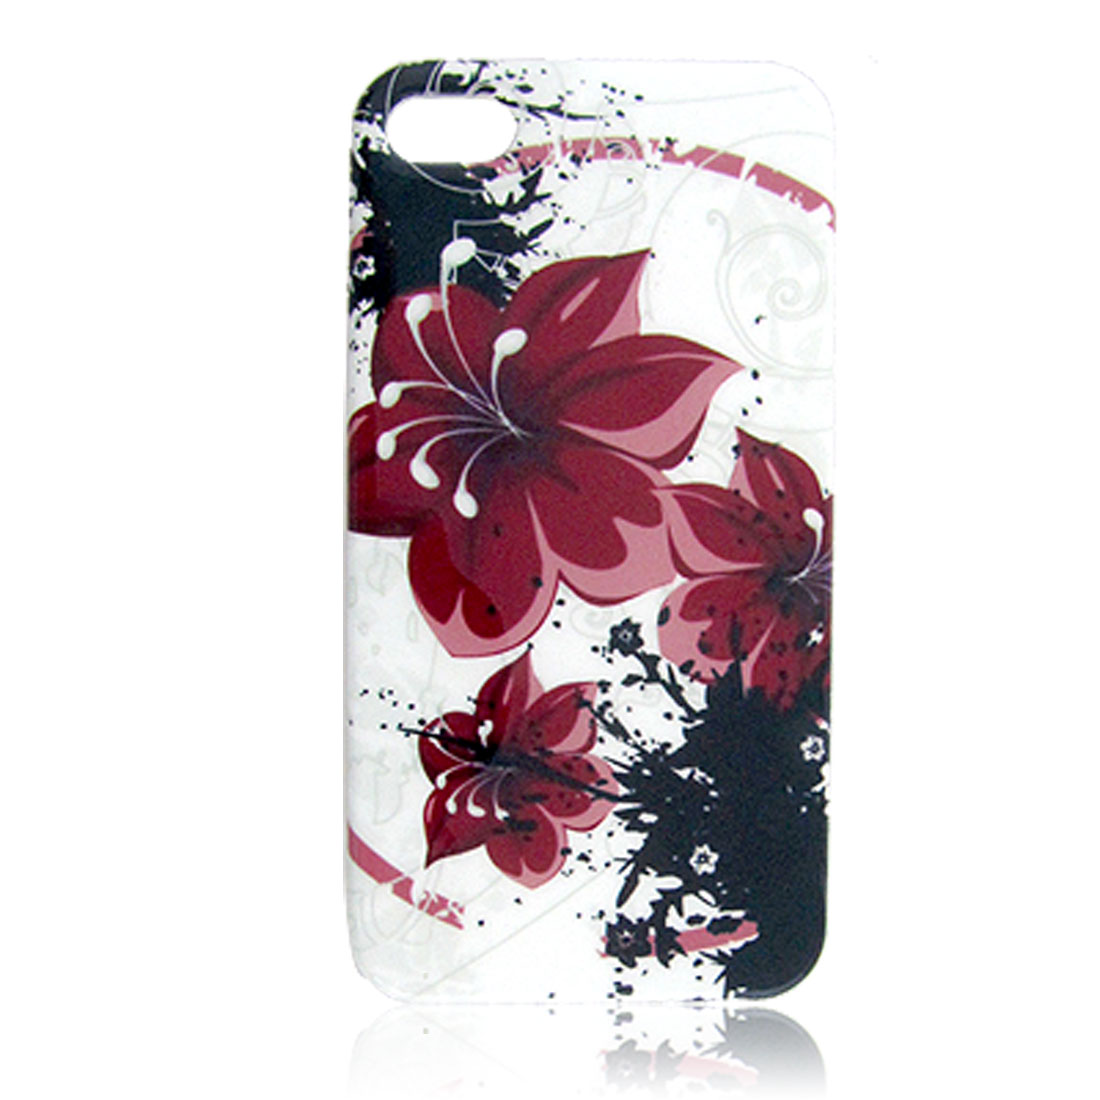 Floral Print Nonslip Side Plastic IMD Back Cover White for iPhone 4 4G